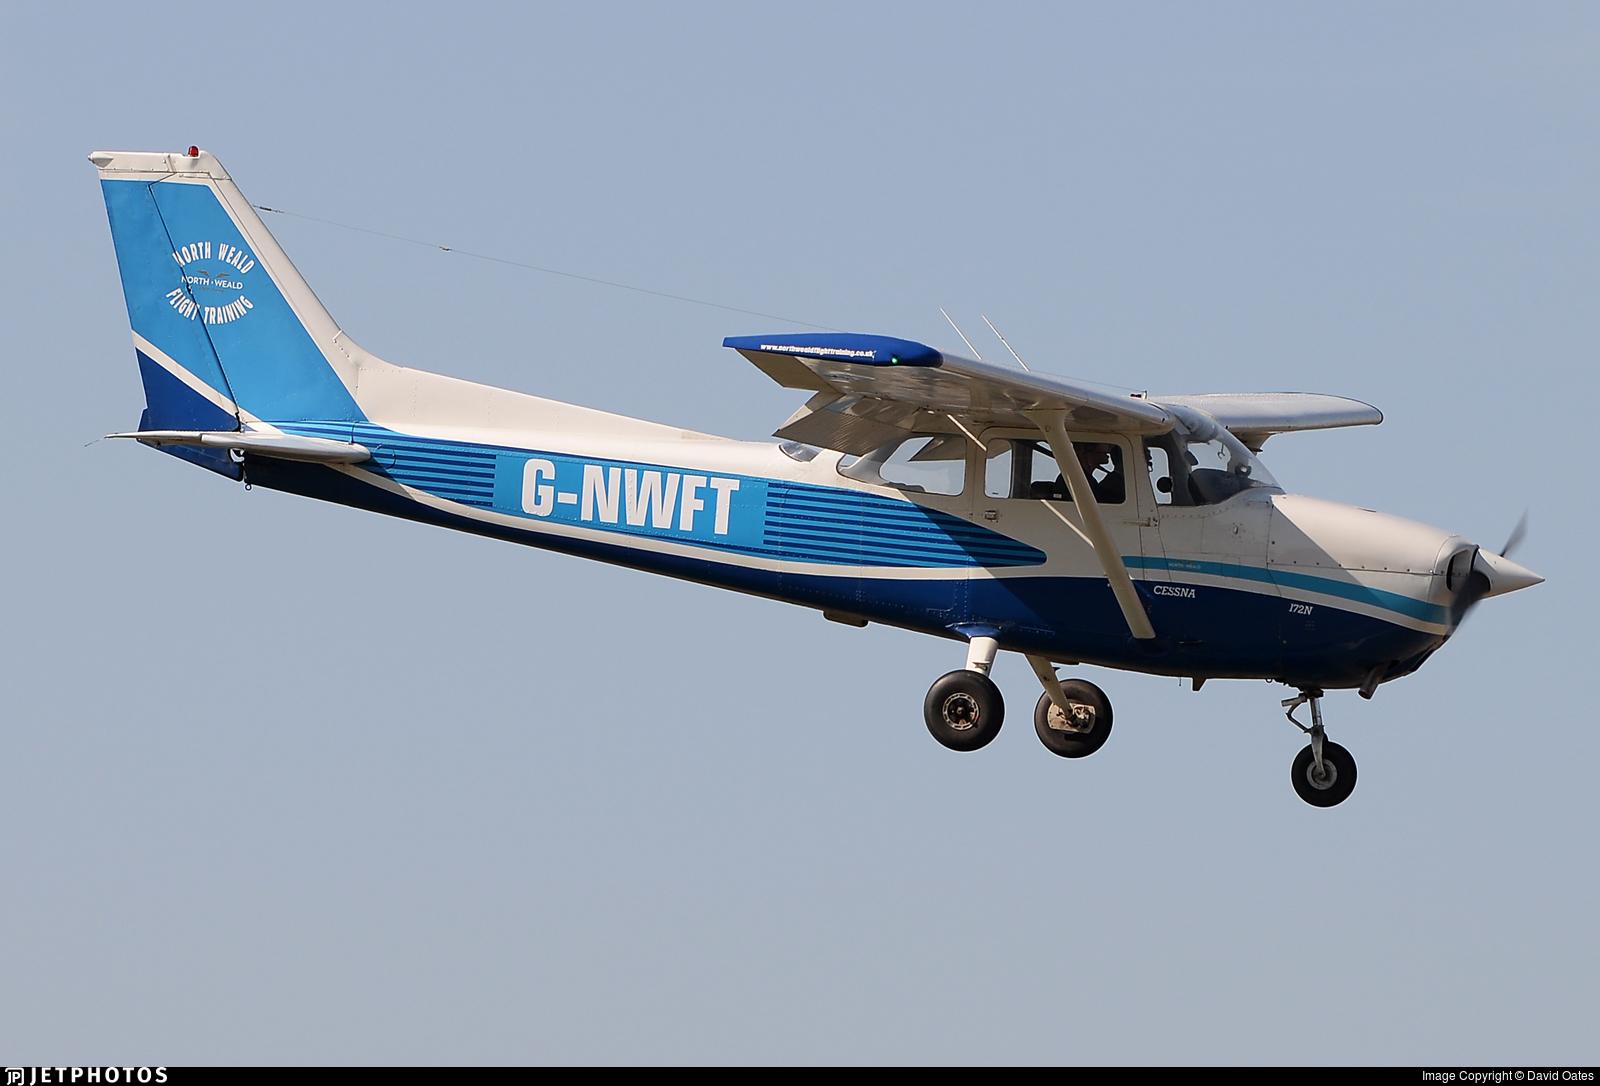 G-NWFT - Reims-Cessna F172N Skyhawk - North Weald Flight Training